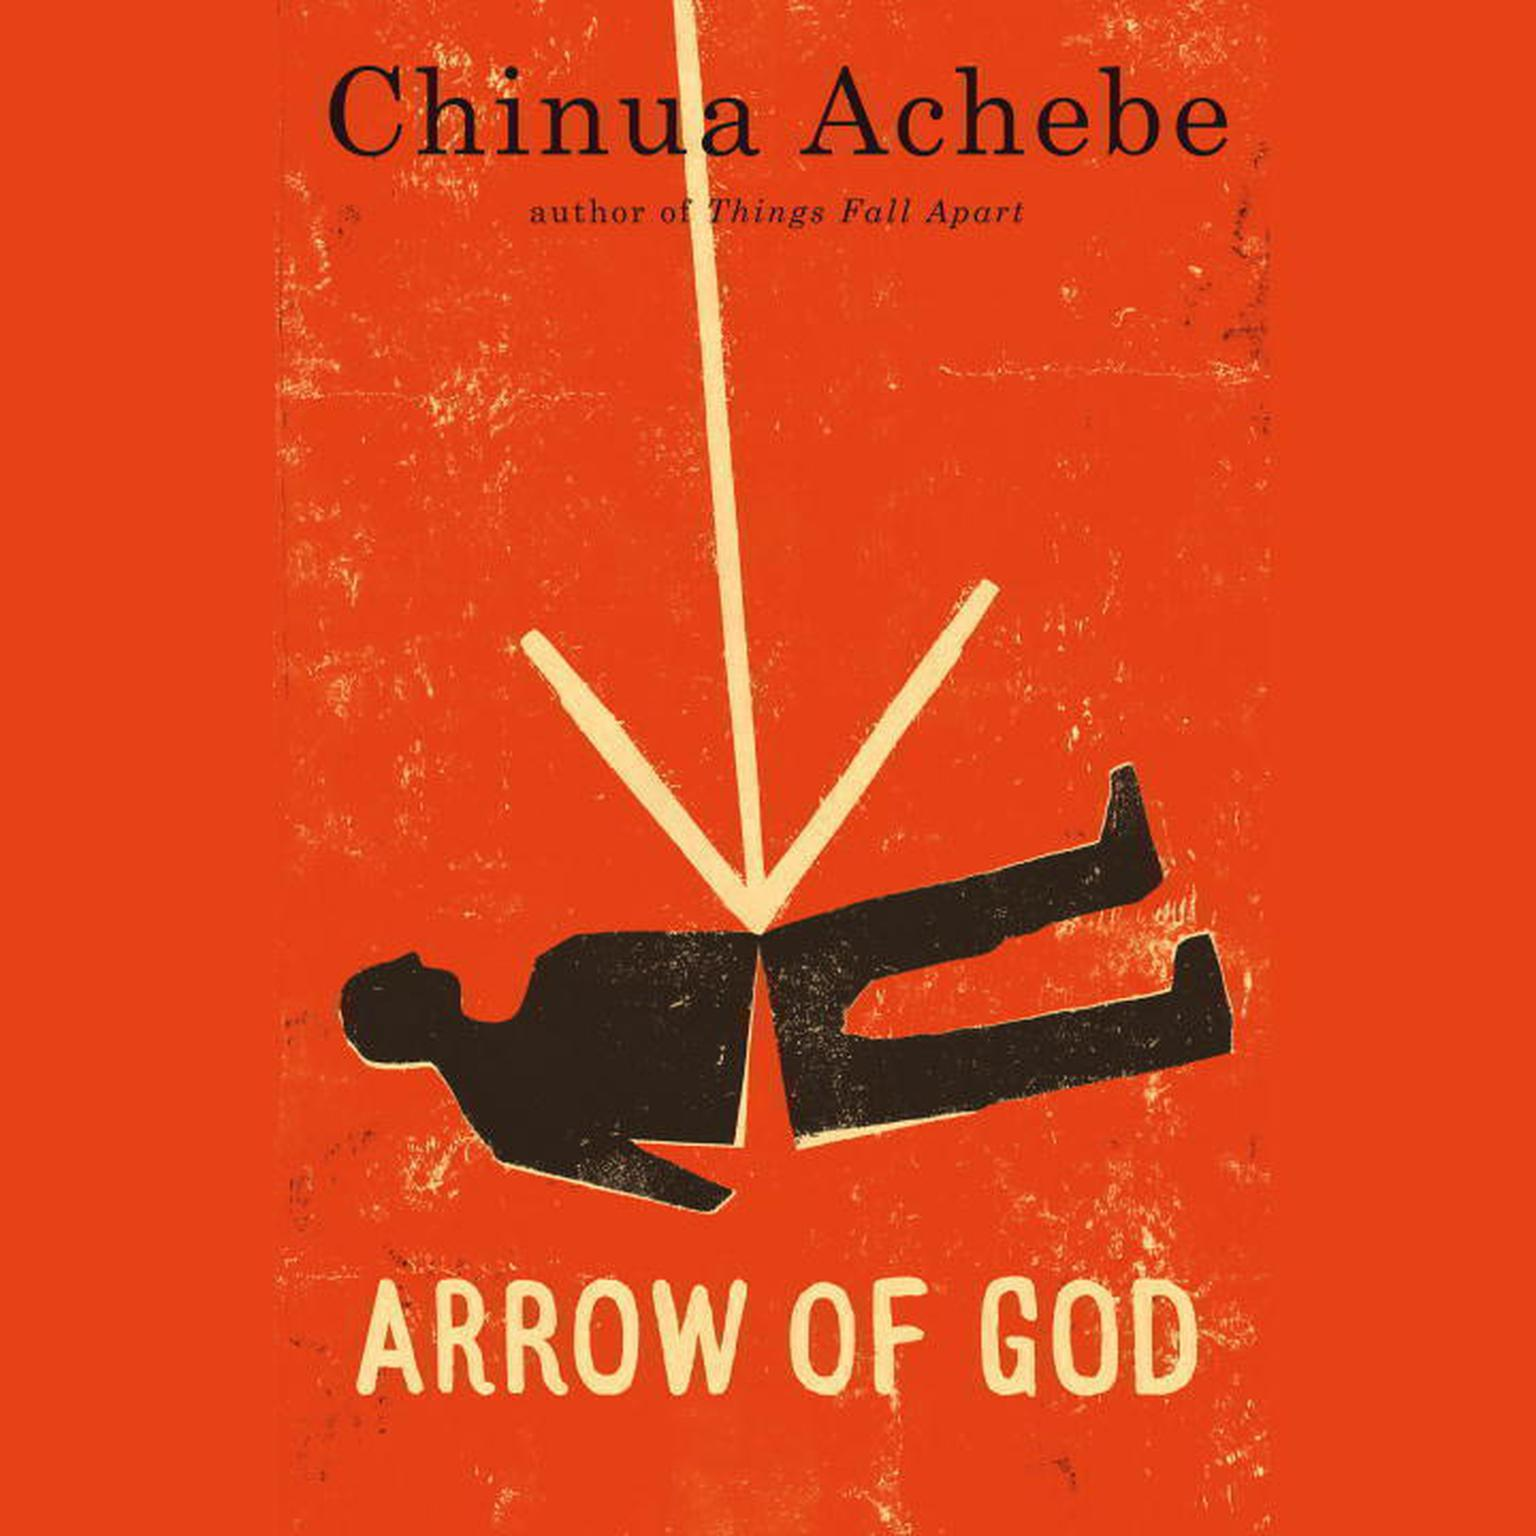 Chinua Achebe's Arrow of God for President Buhari?